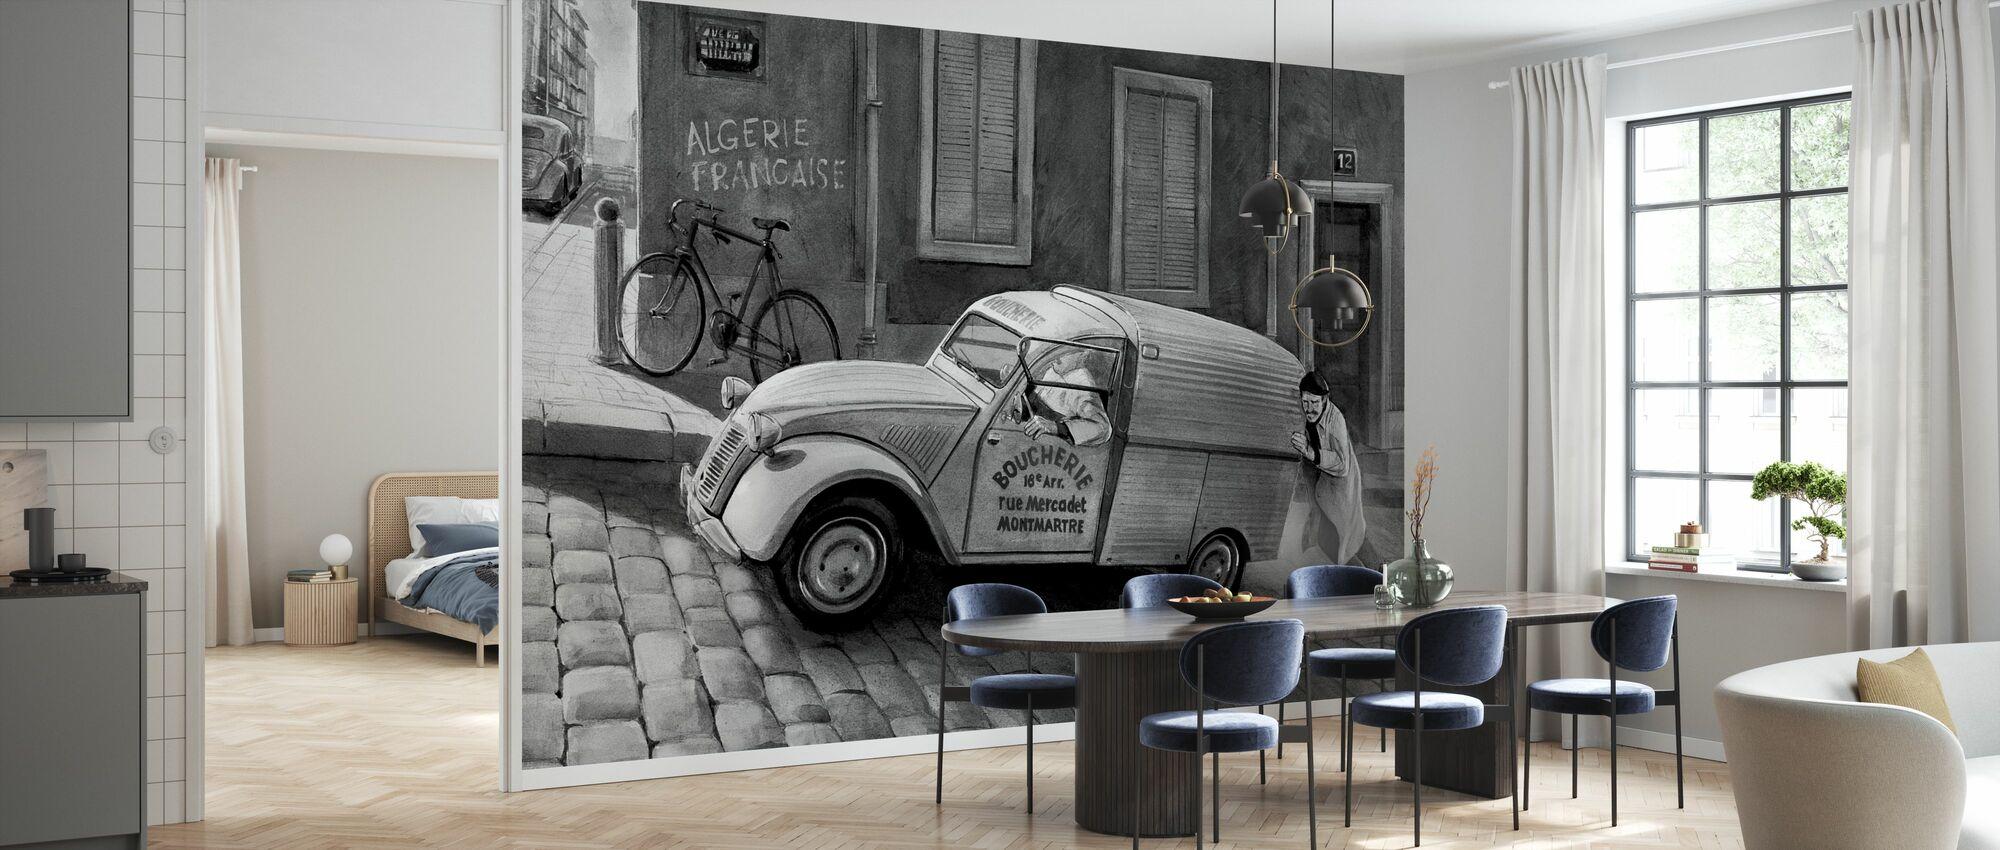 Car In Paris BW - Wallpaper - Kitchen